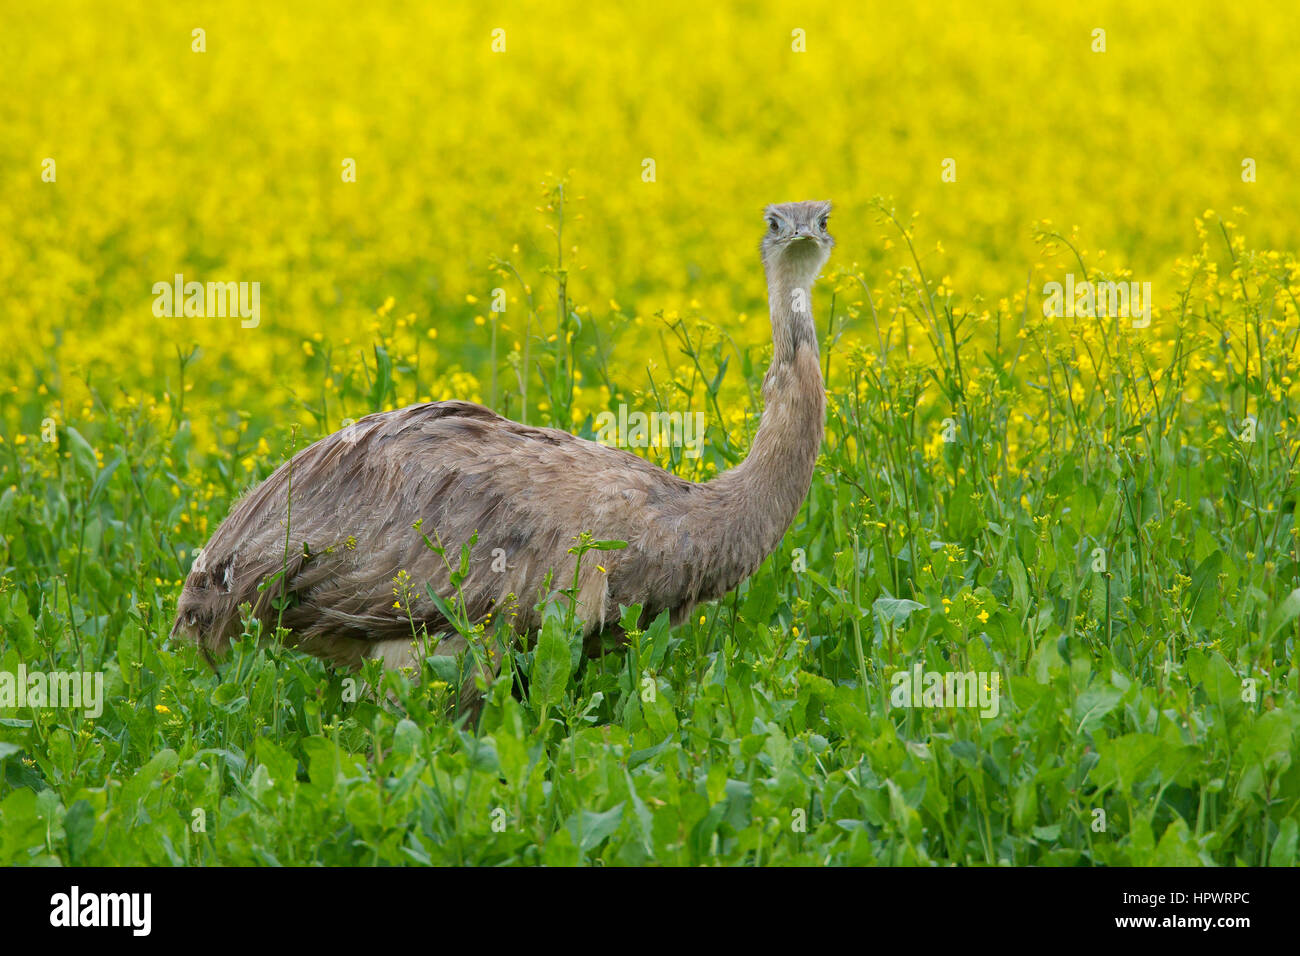 Greater rhea / American rhea / ñandú (Rhea americana), flightless bird / ratite native to eastern South - Stock Image